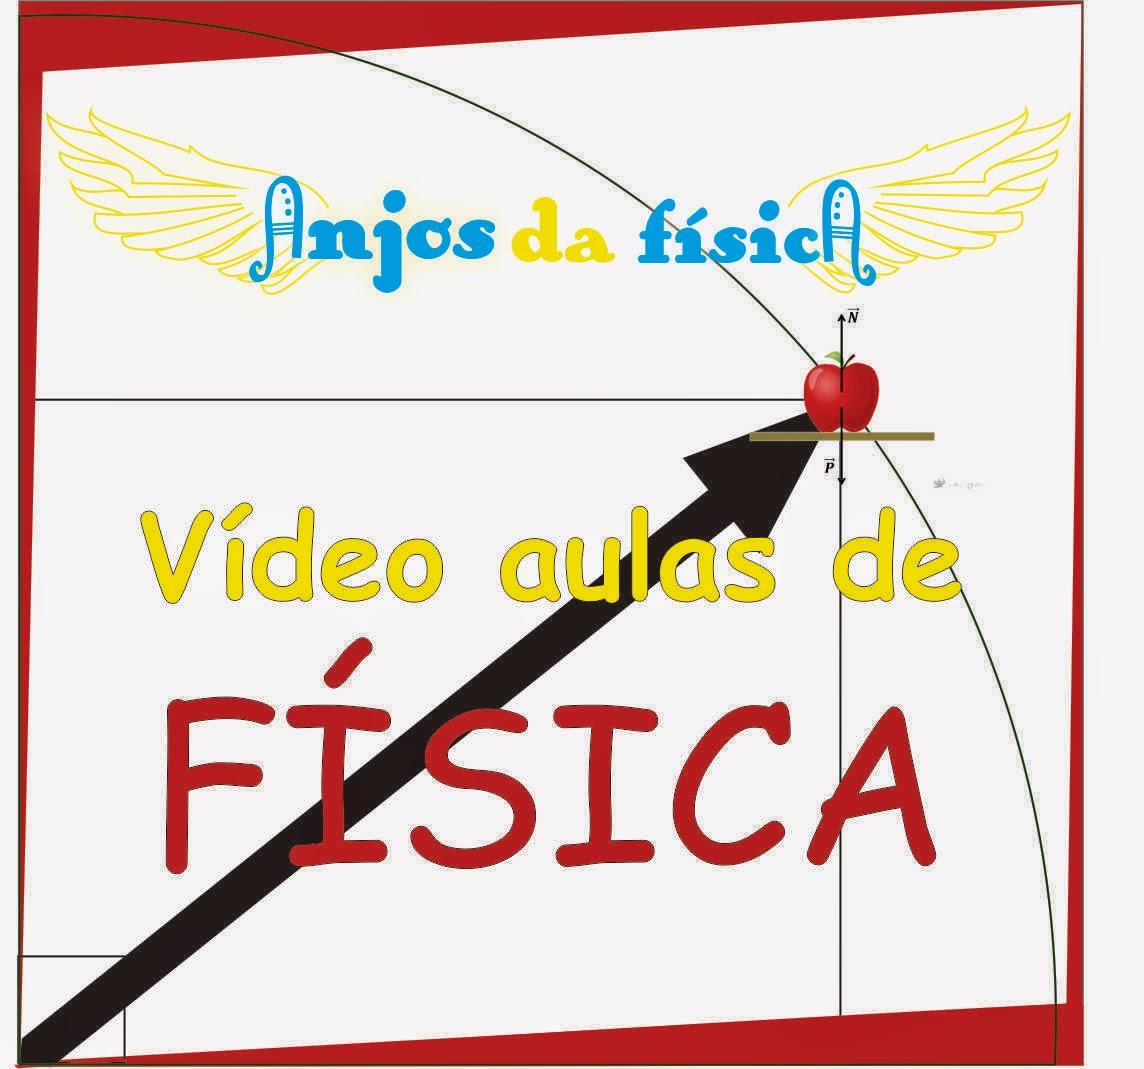 http://anjosdafisica-fisica.blogspot.com.br/2015/01/video-aulas-de-fisica.html